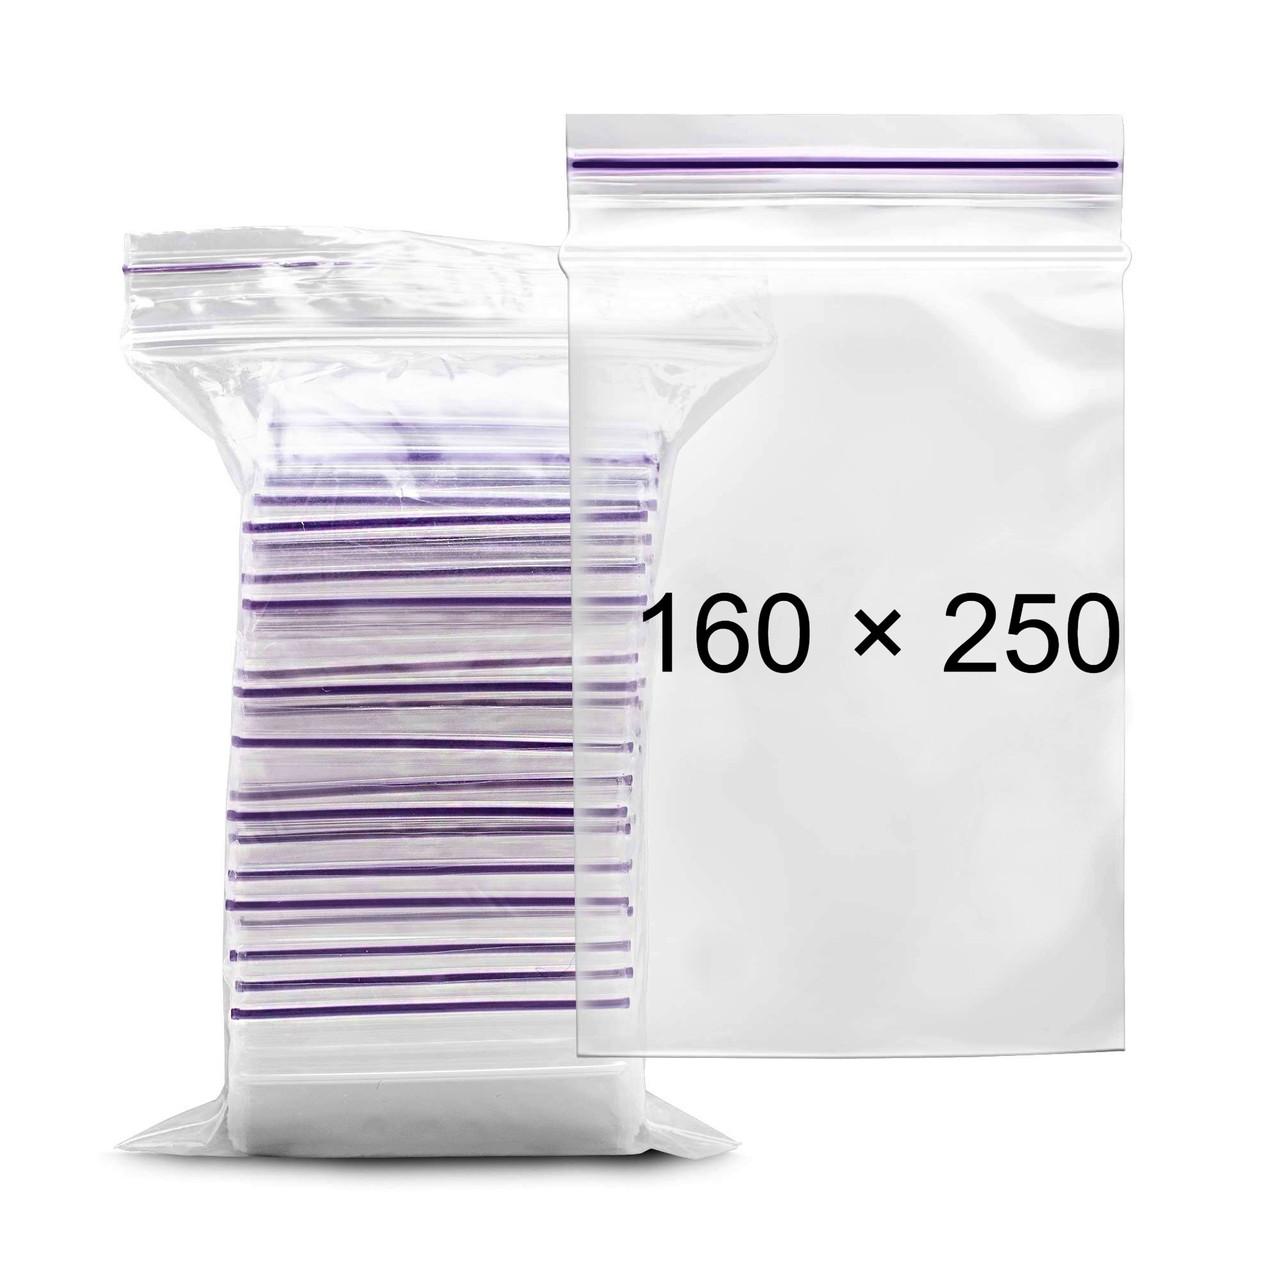 Пакеты с замком Zip-Lock - 160 × 250